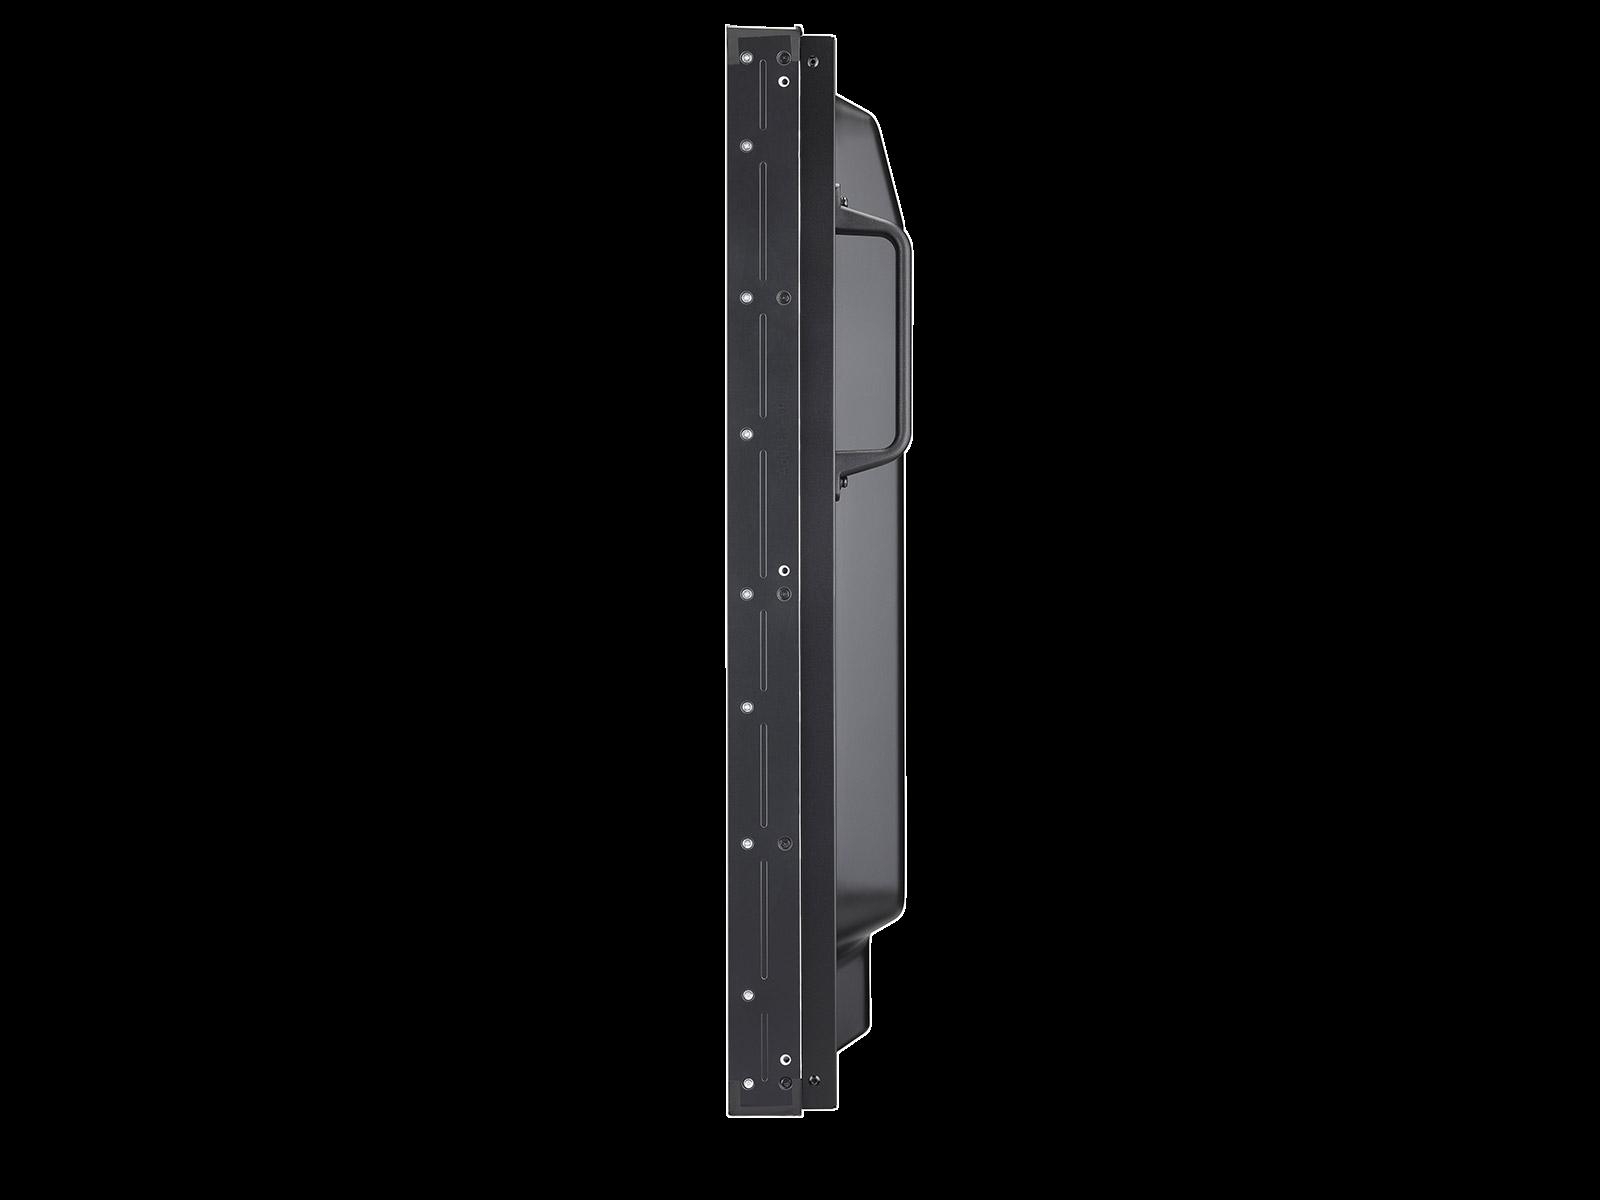 X554UNV-DisplaySideViewLeft